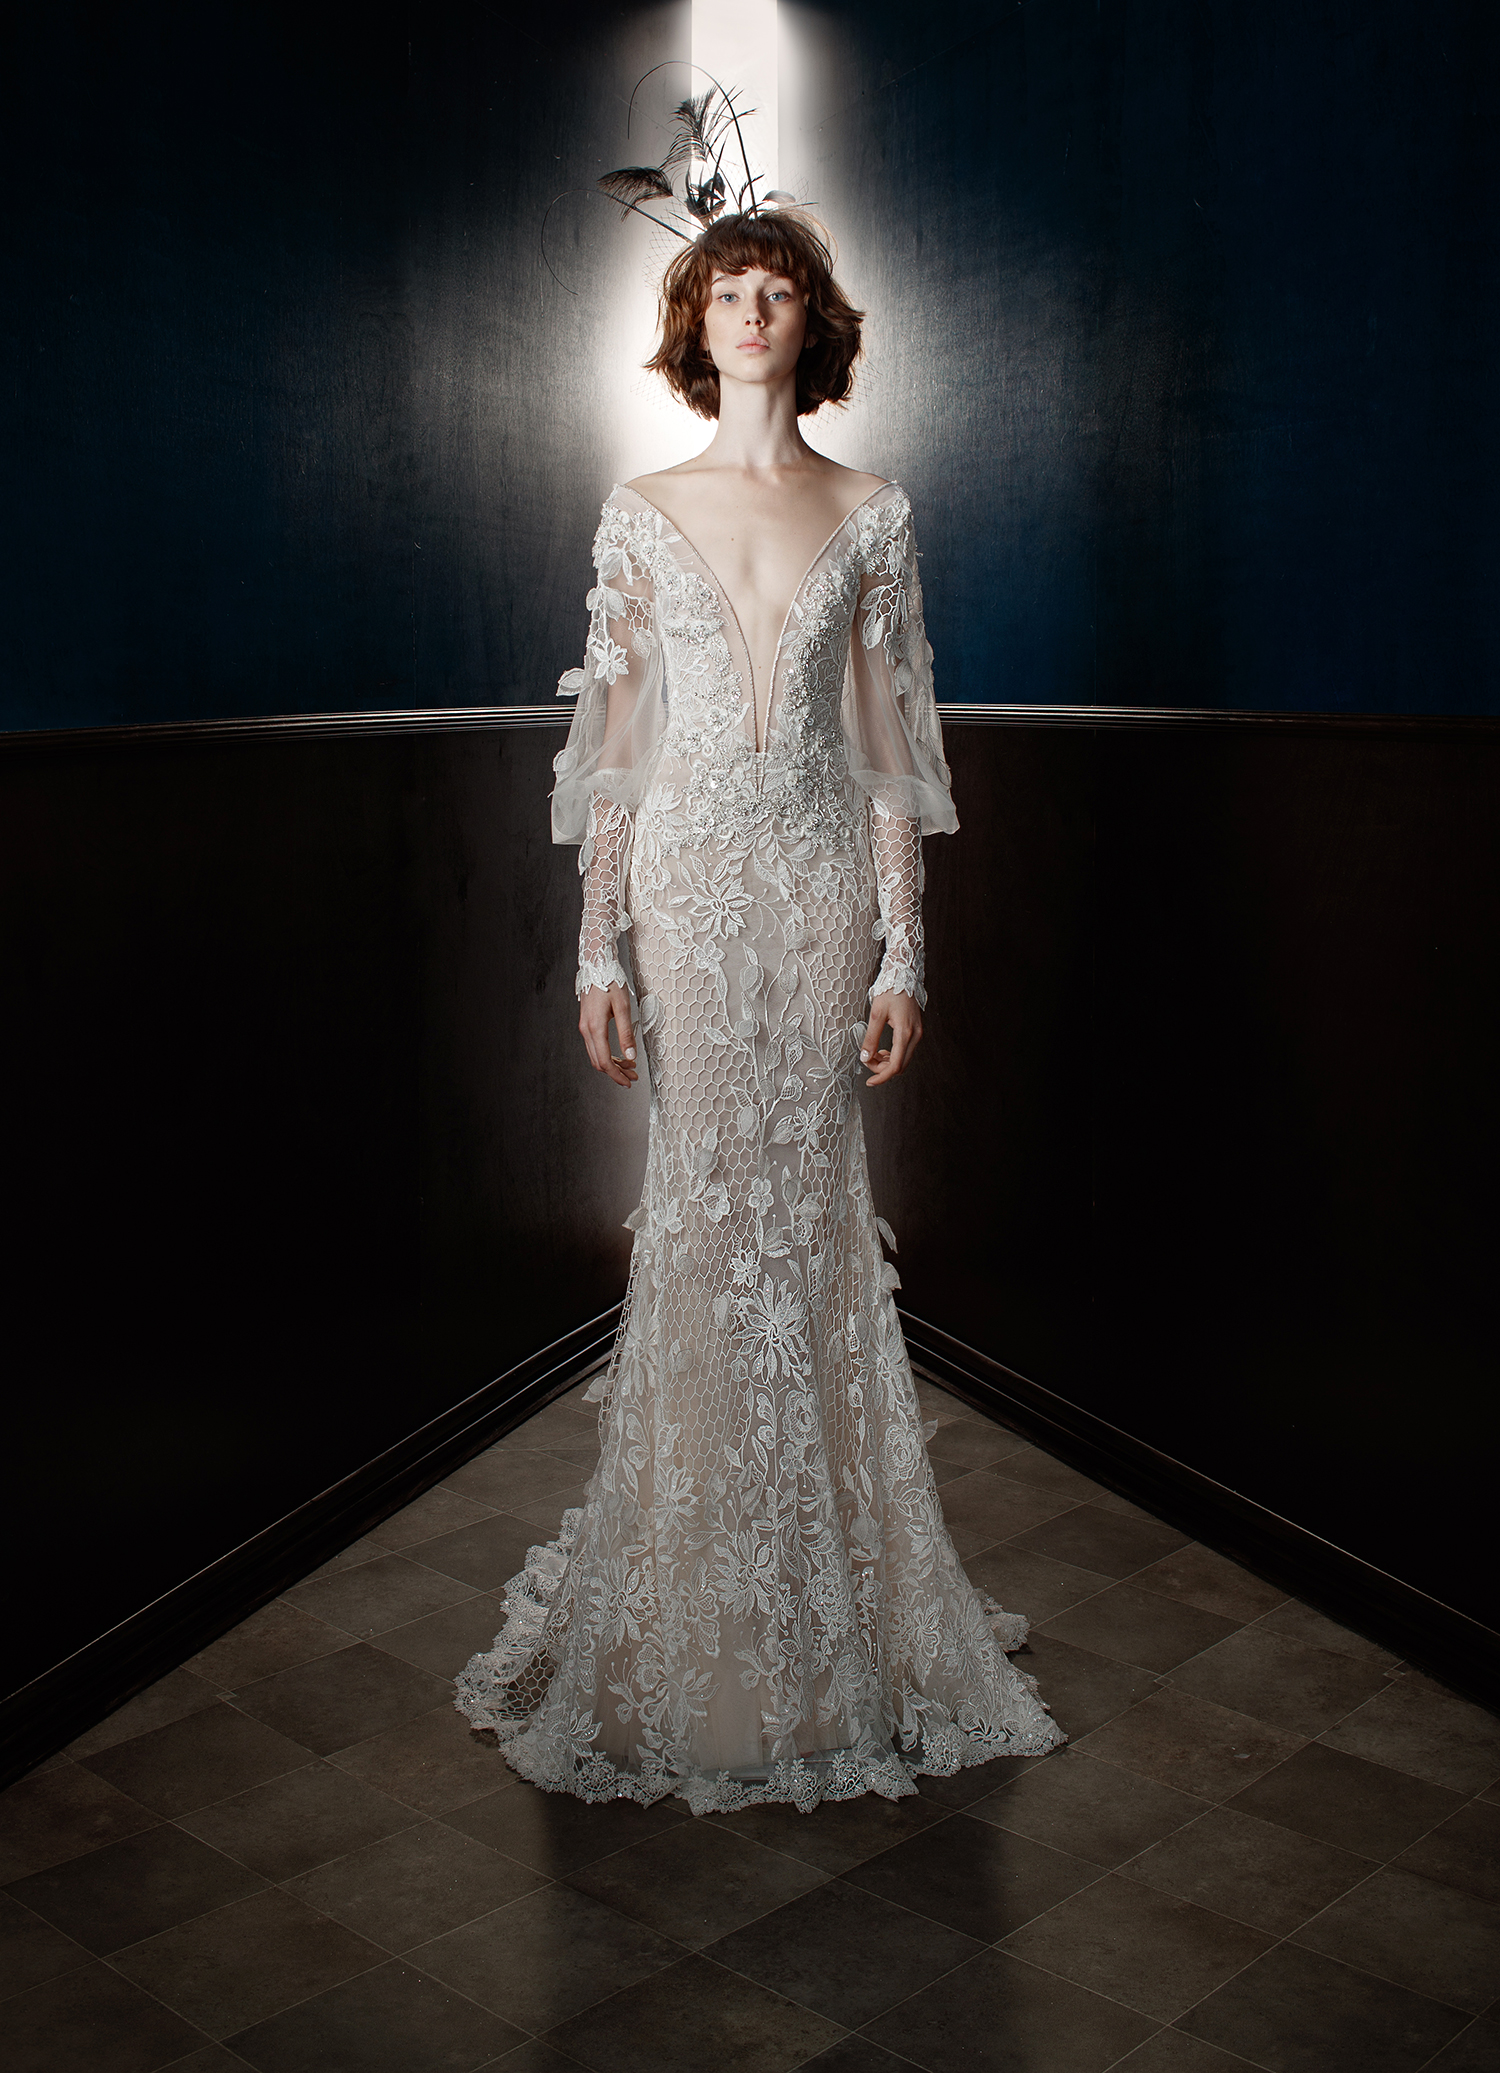 galia lahav wedding dress spring 2018 plunging v-neck long sleeves